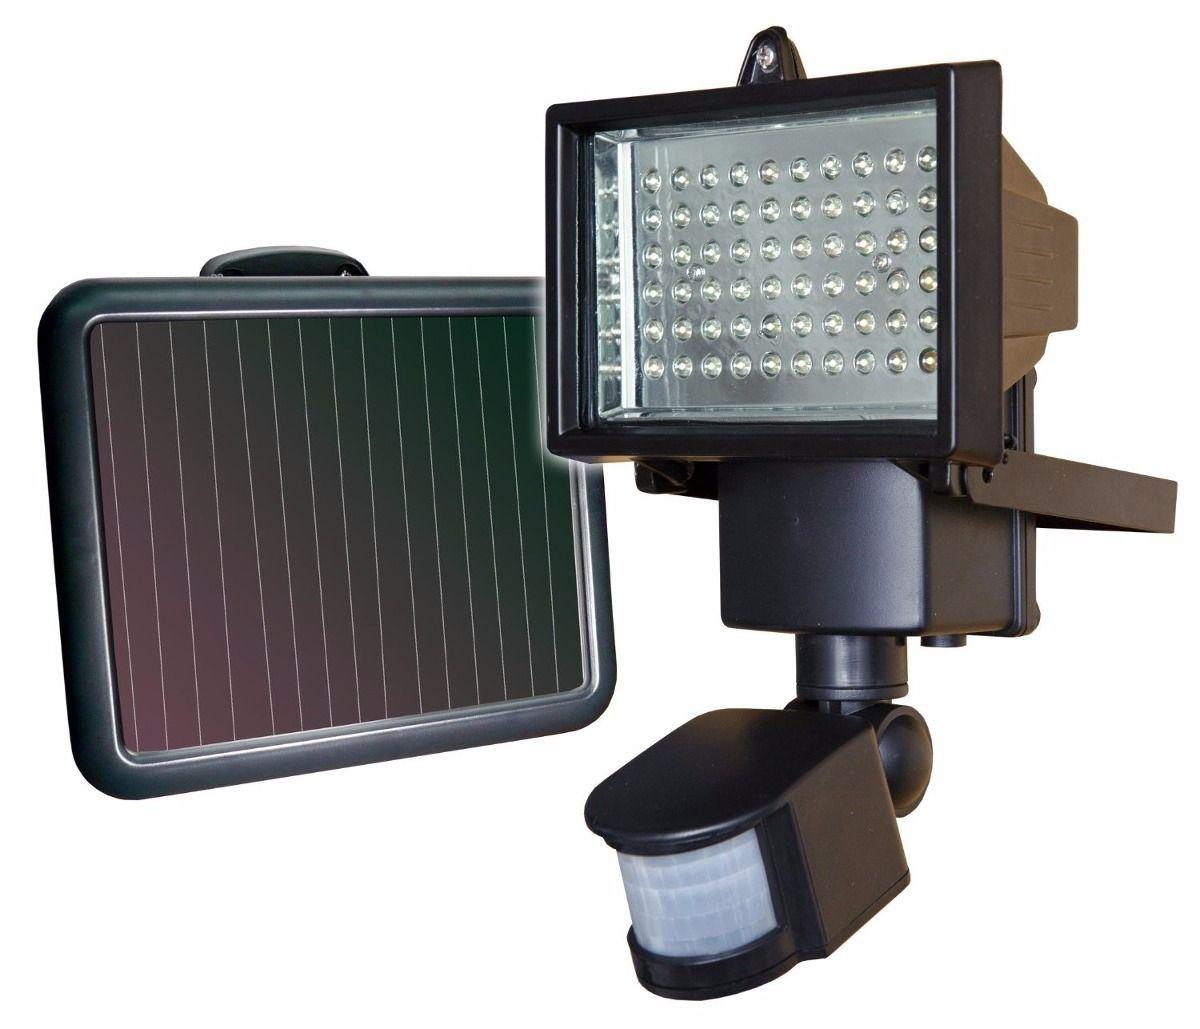 32 Lampara Sunforce De 60 Leds Solar C Sensor De Movimiento 1 250 00 En Mercadolibre Iluminacion Solar Al Aire Libre Proyector Led Luces Solares